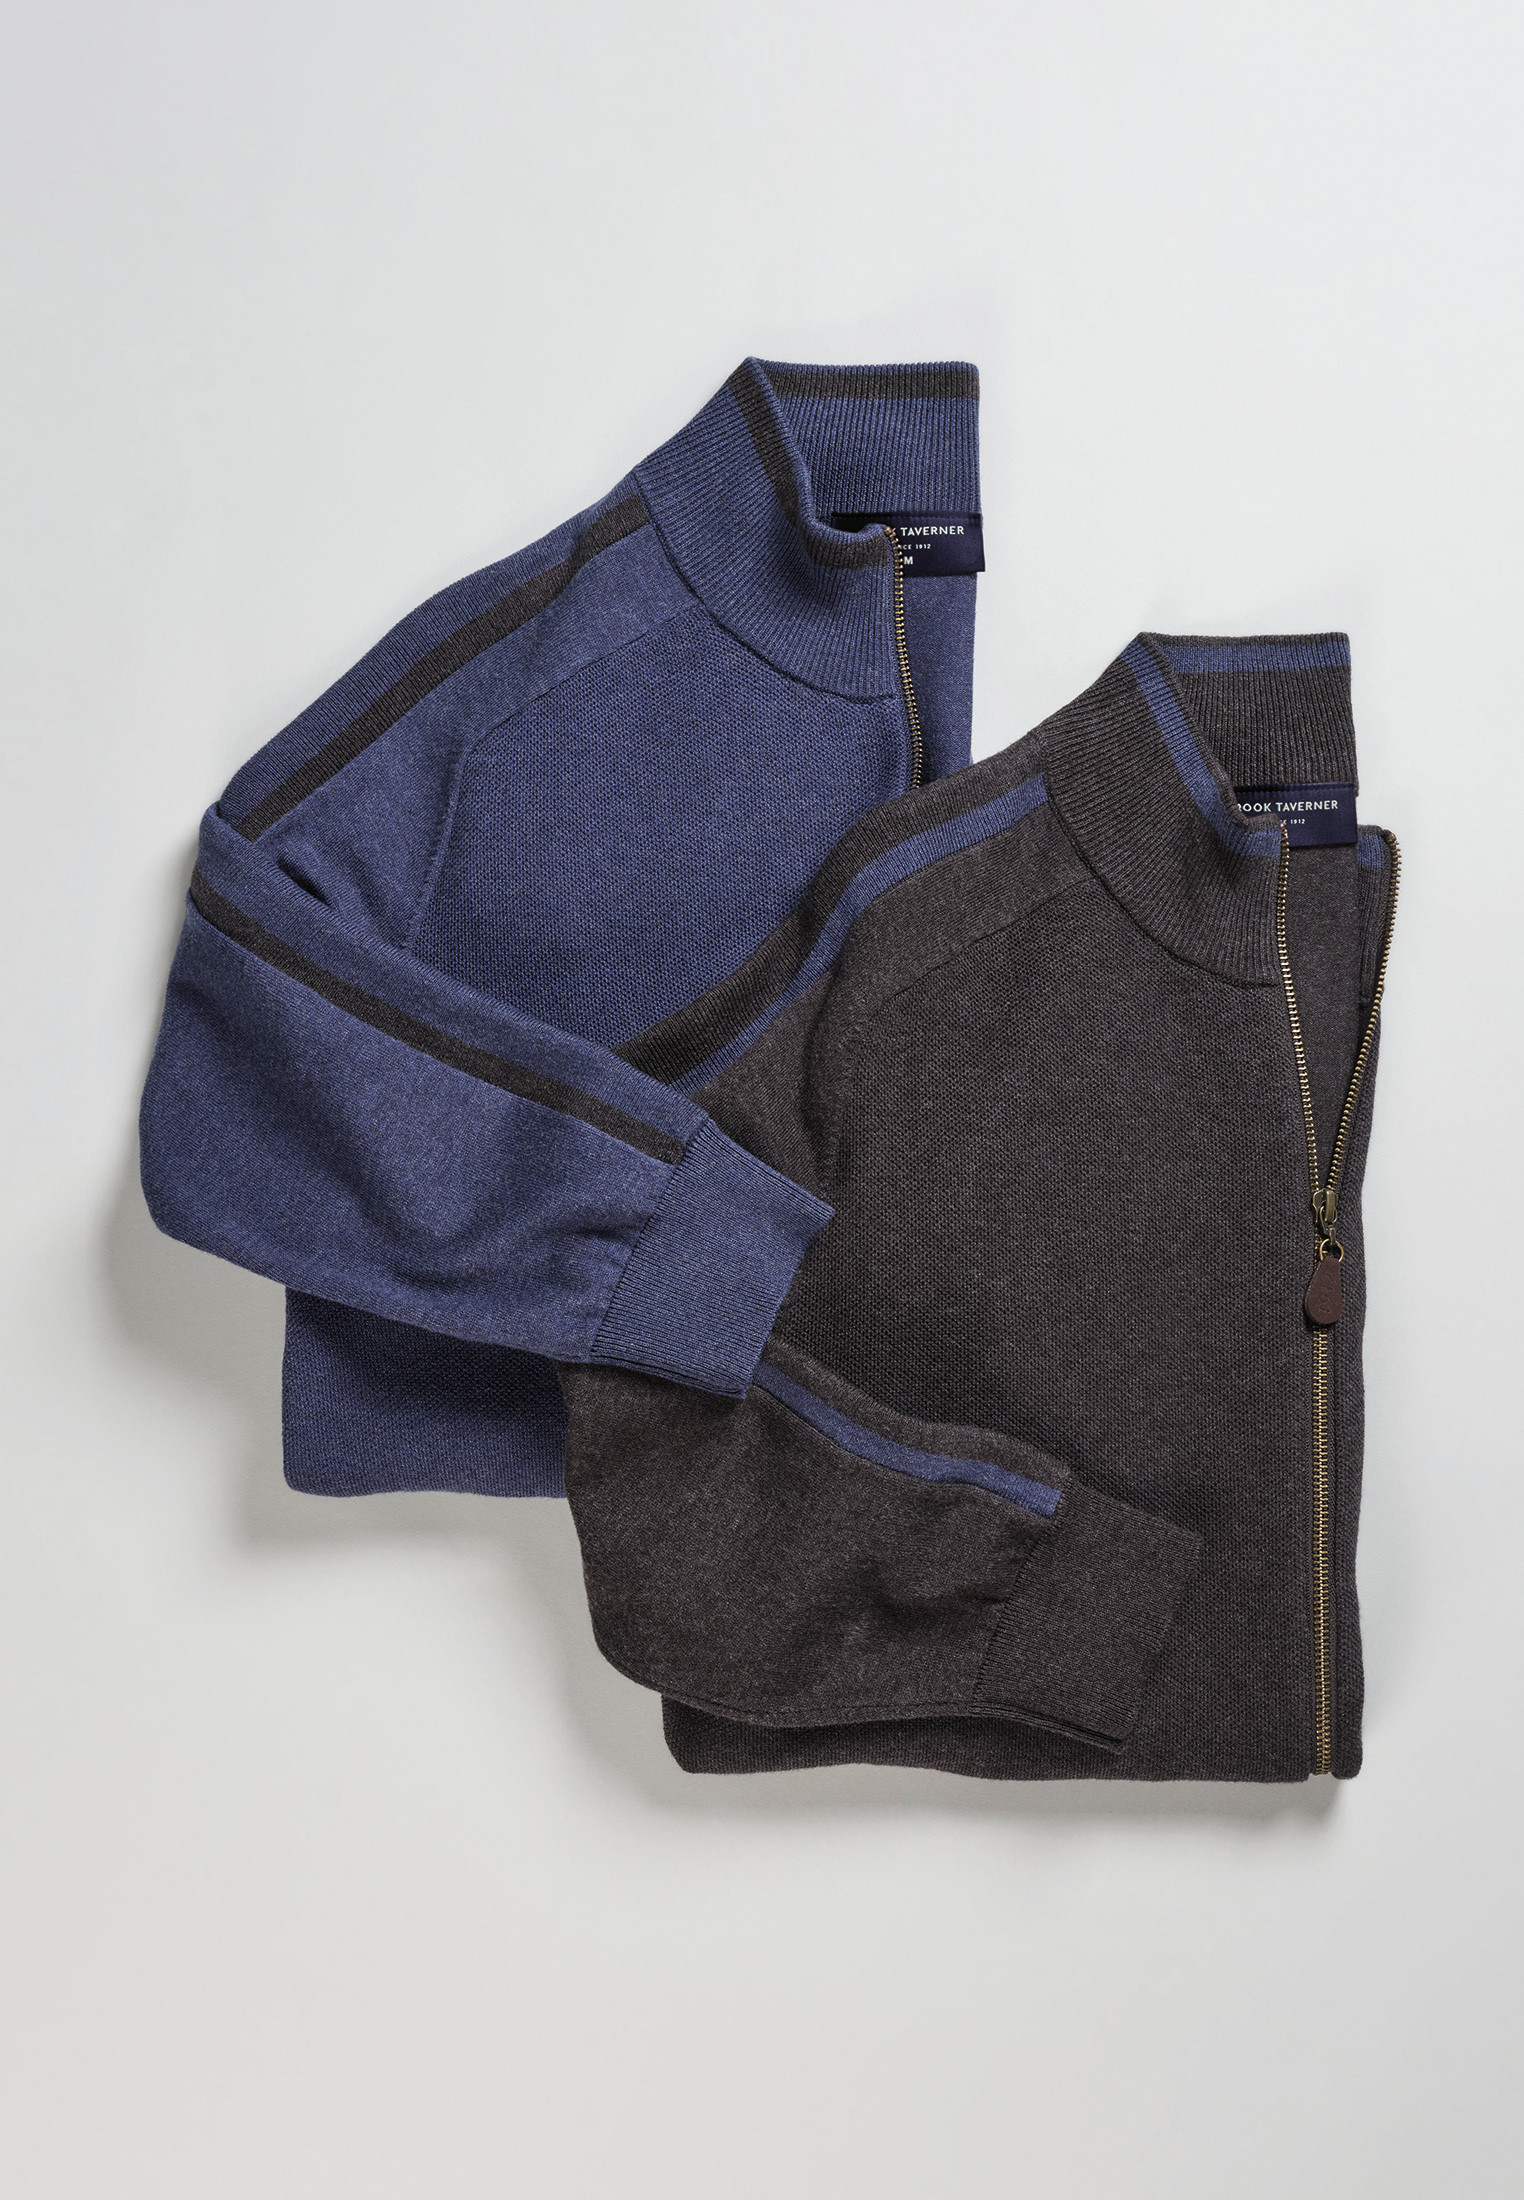 Linton Charcoal 14 Gauge Zip Through Cardigan